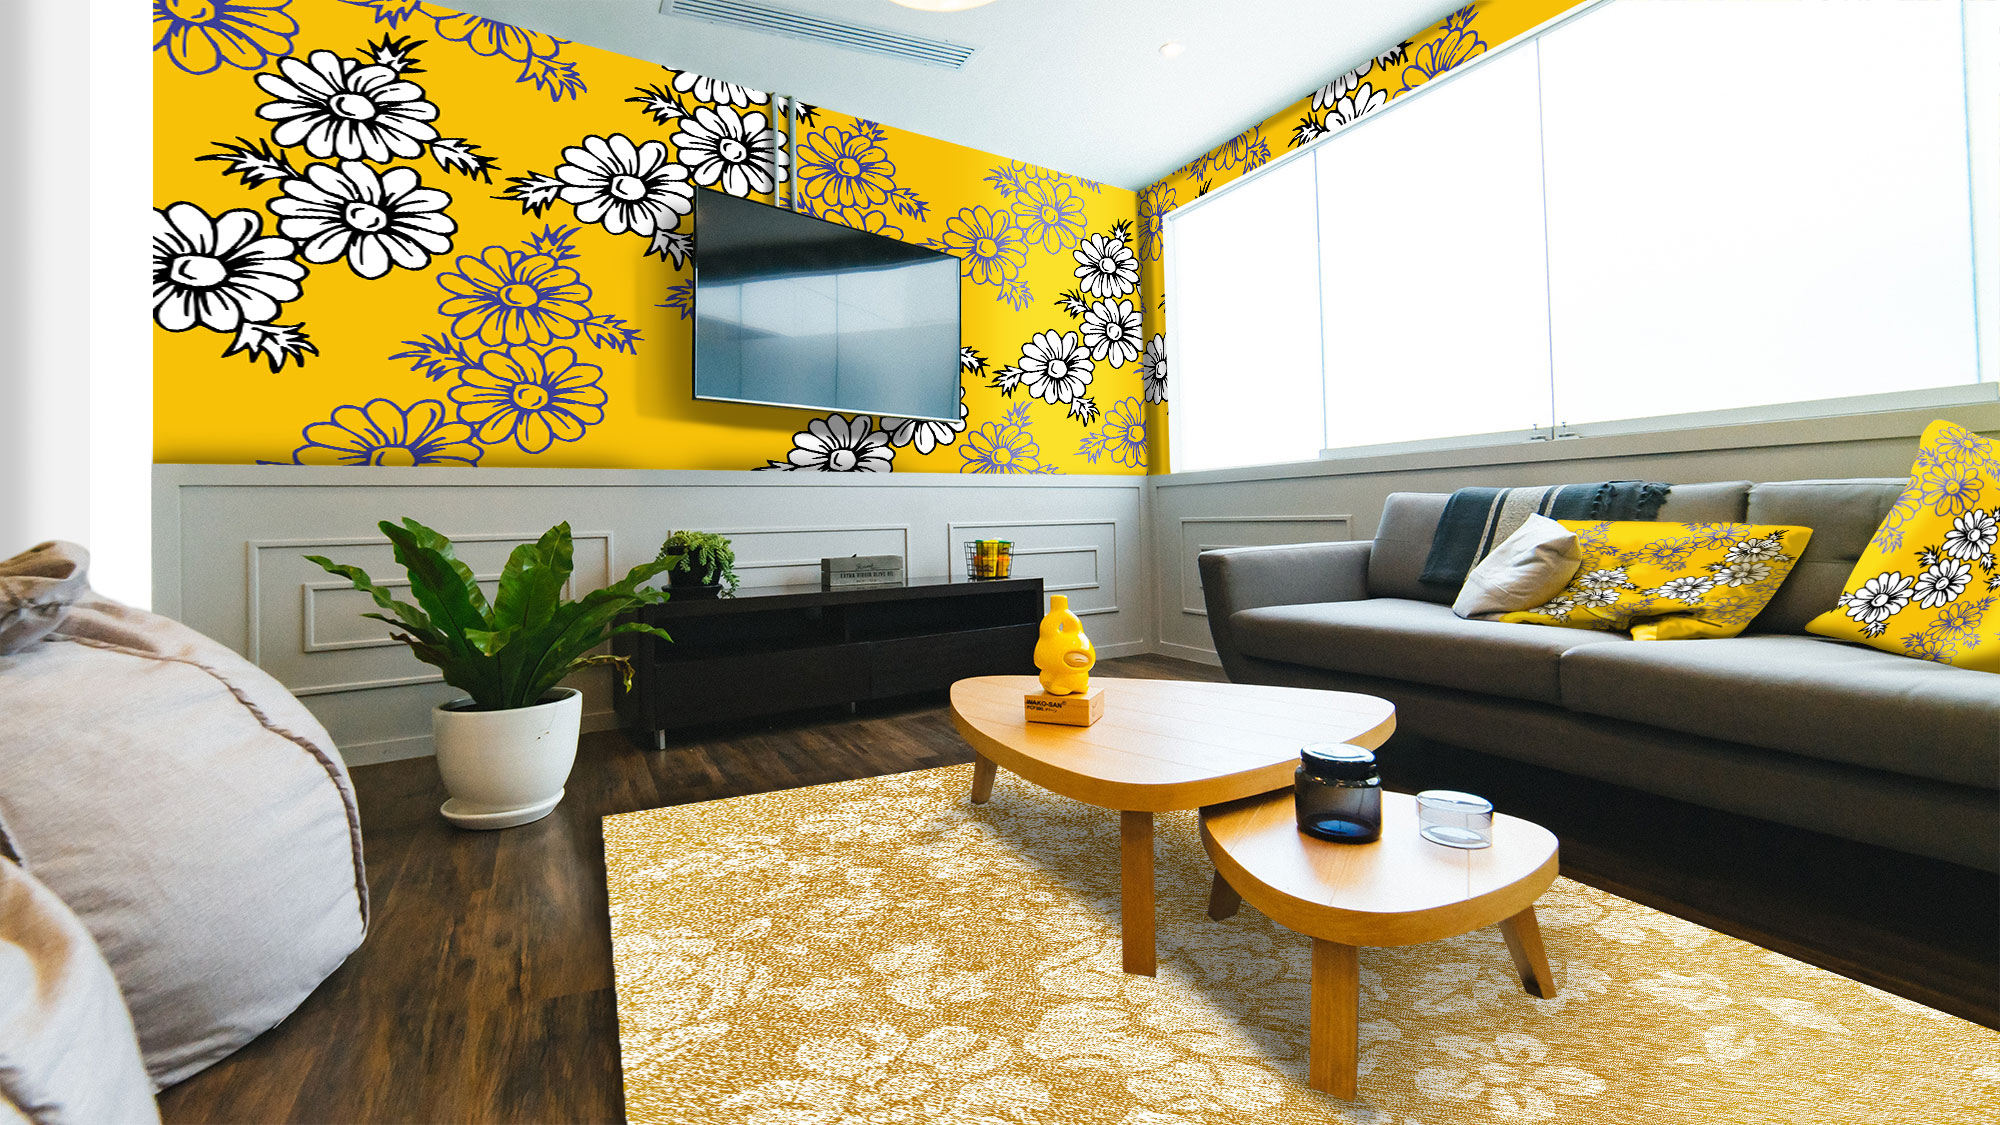 دانلود موکاپ کاغذ دیواری و کوسن و فرش